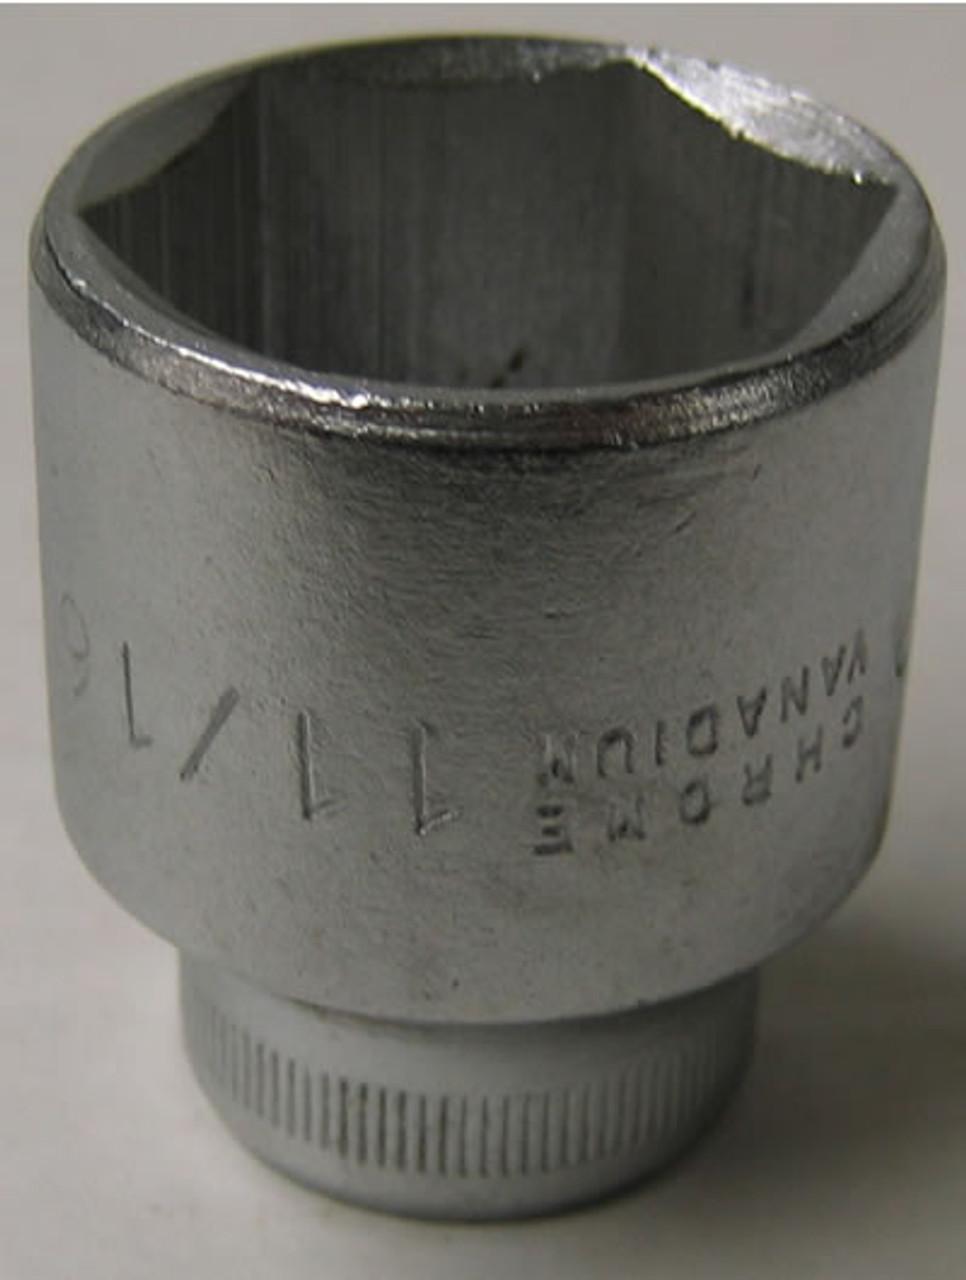 "Everest 11/16"" Whitworth Socket Spanner - (ES10)"